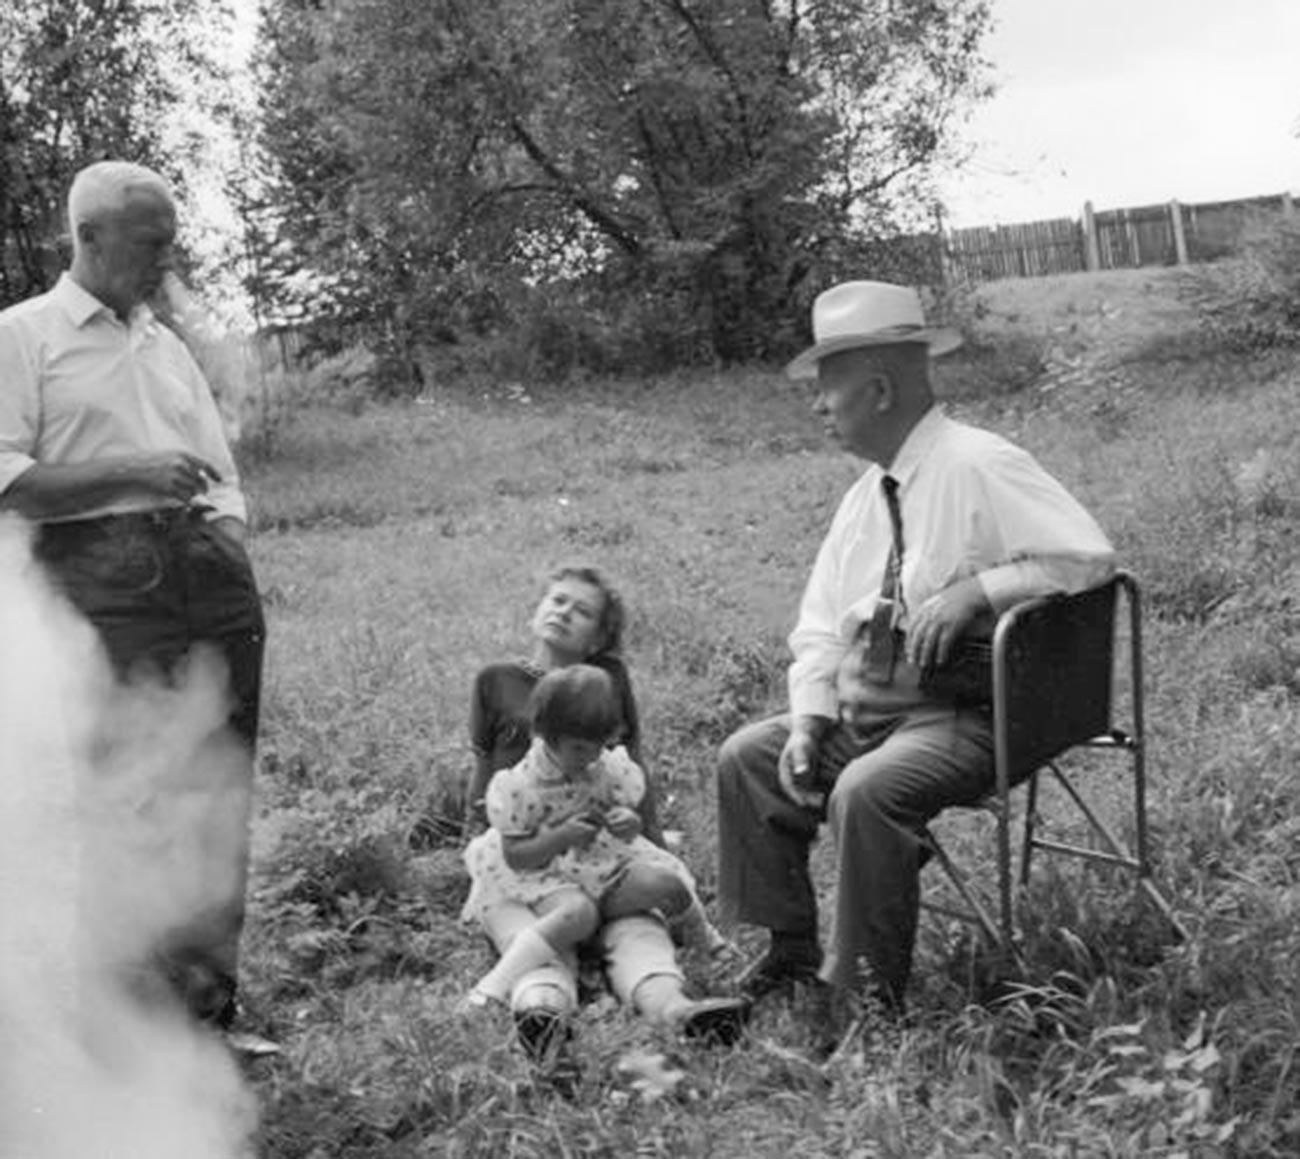 Nikita Khrushchev, Roman Karmen, dan seorang perempuan tak dikenal dengan seorang anak.